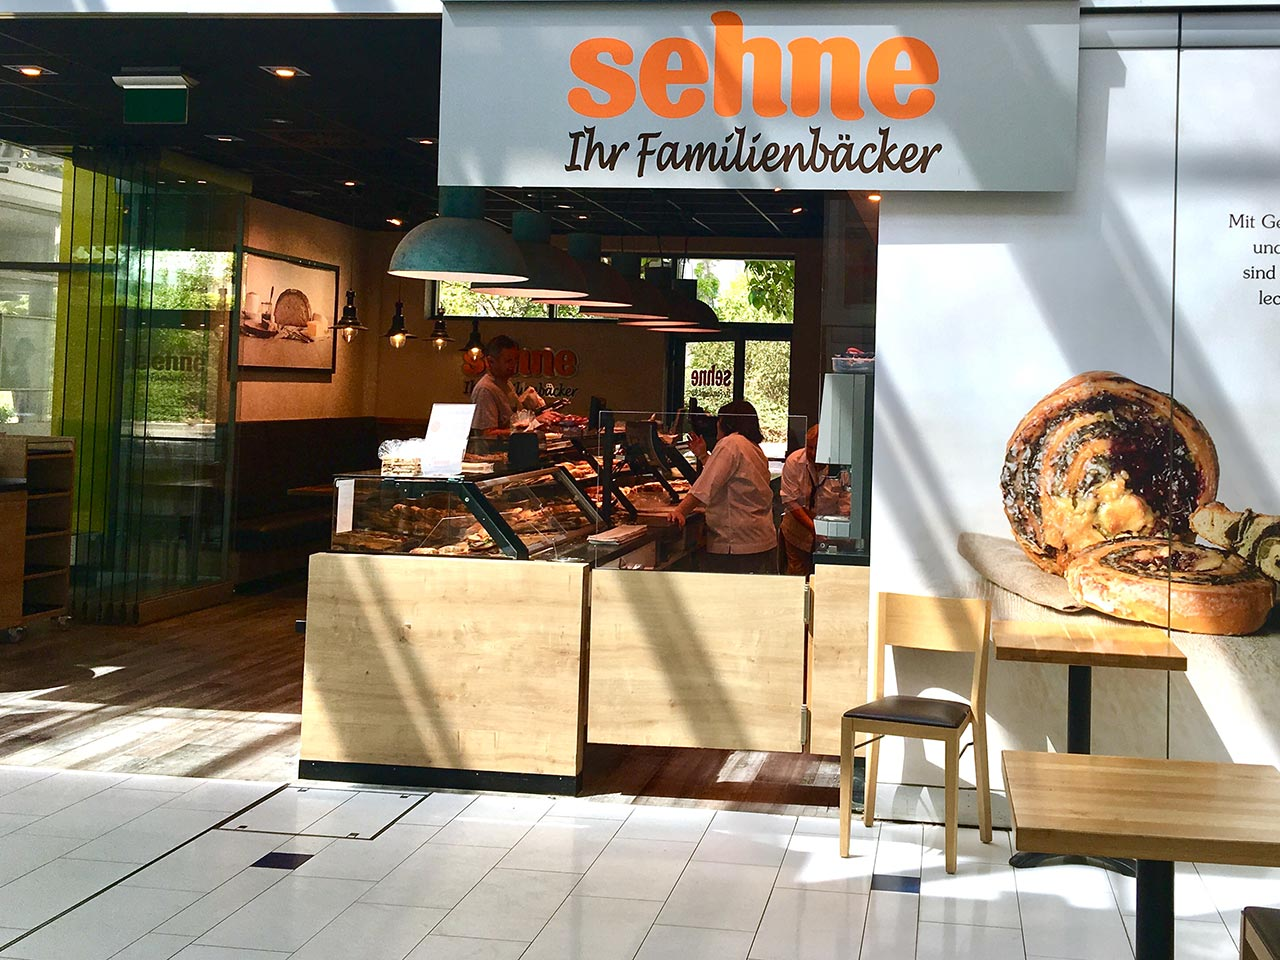 Bäckerei Sehne - Ihr Familienbäcker